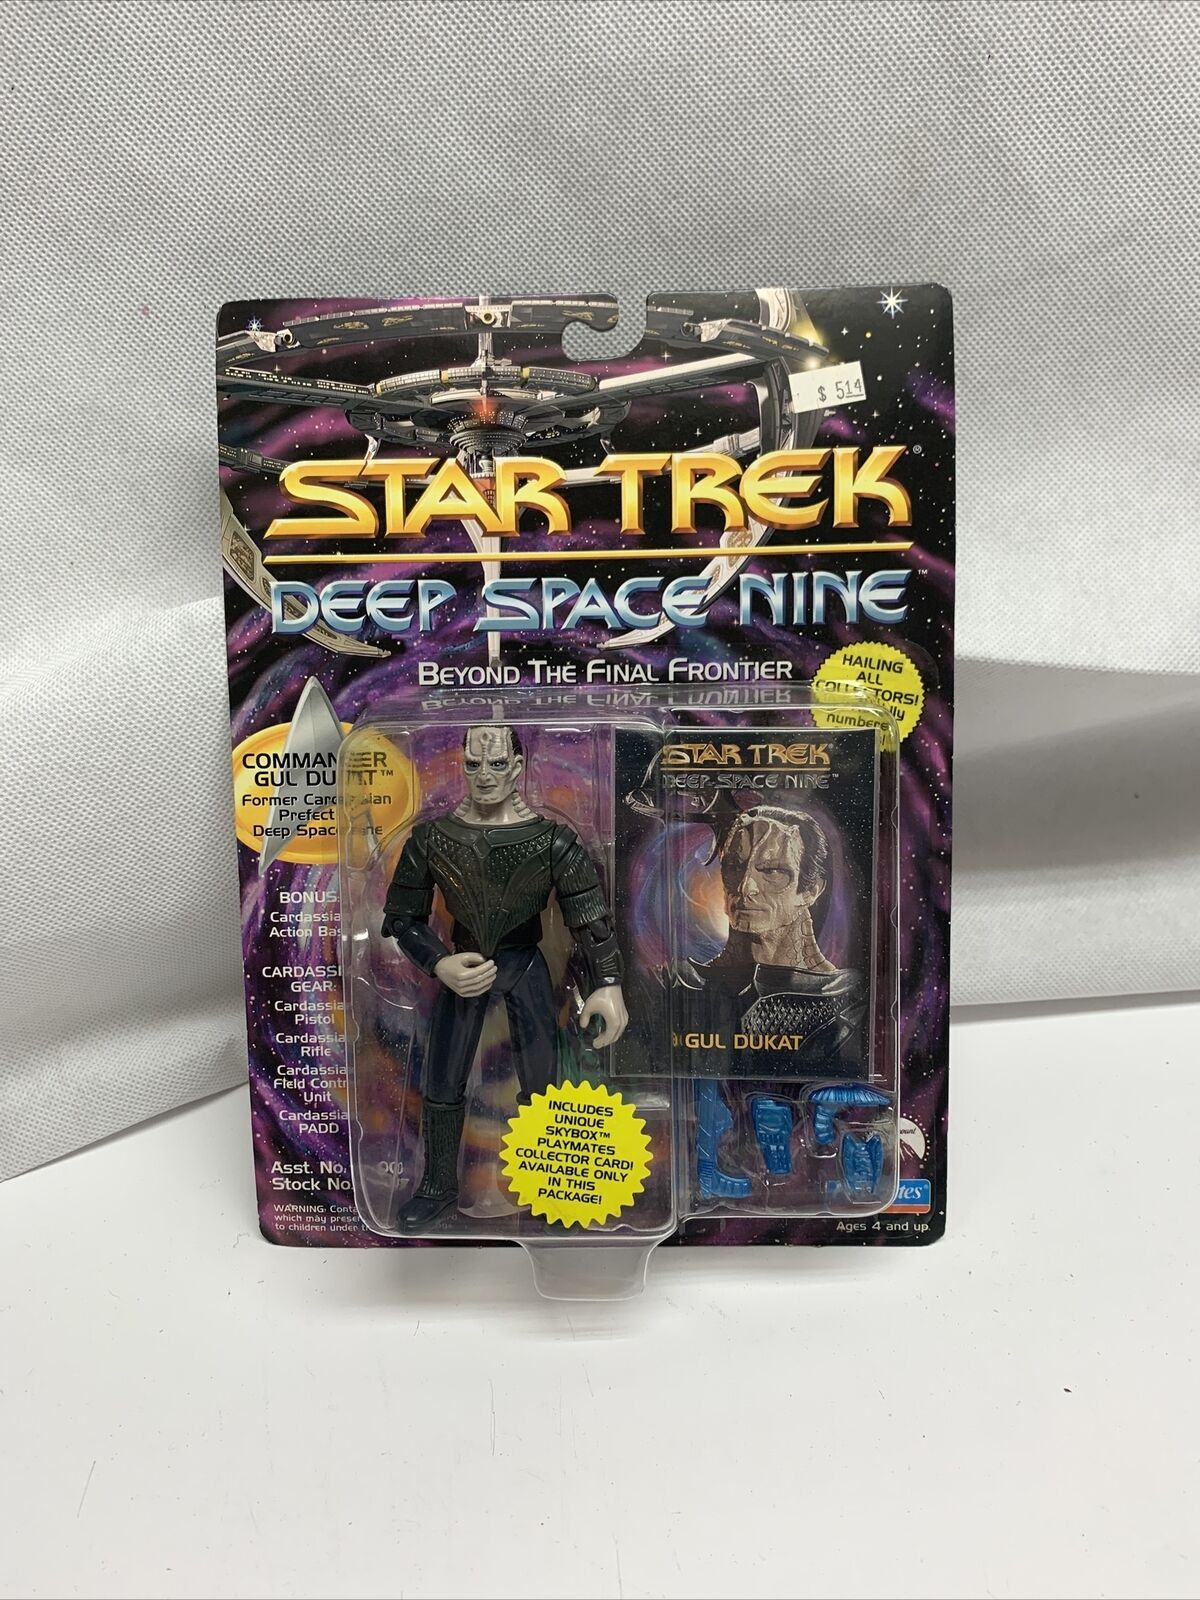 Star Trek Deep Space Nine Commander Gul Dukat Action Figure 1994 LG - $14.85